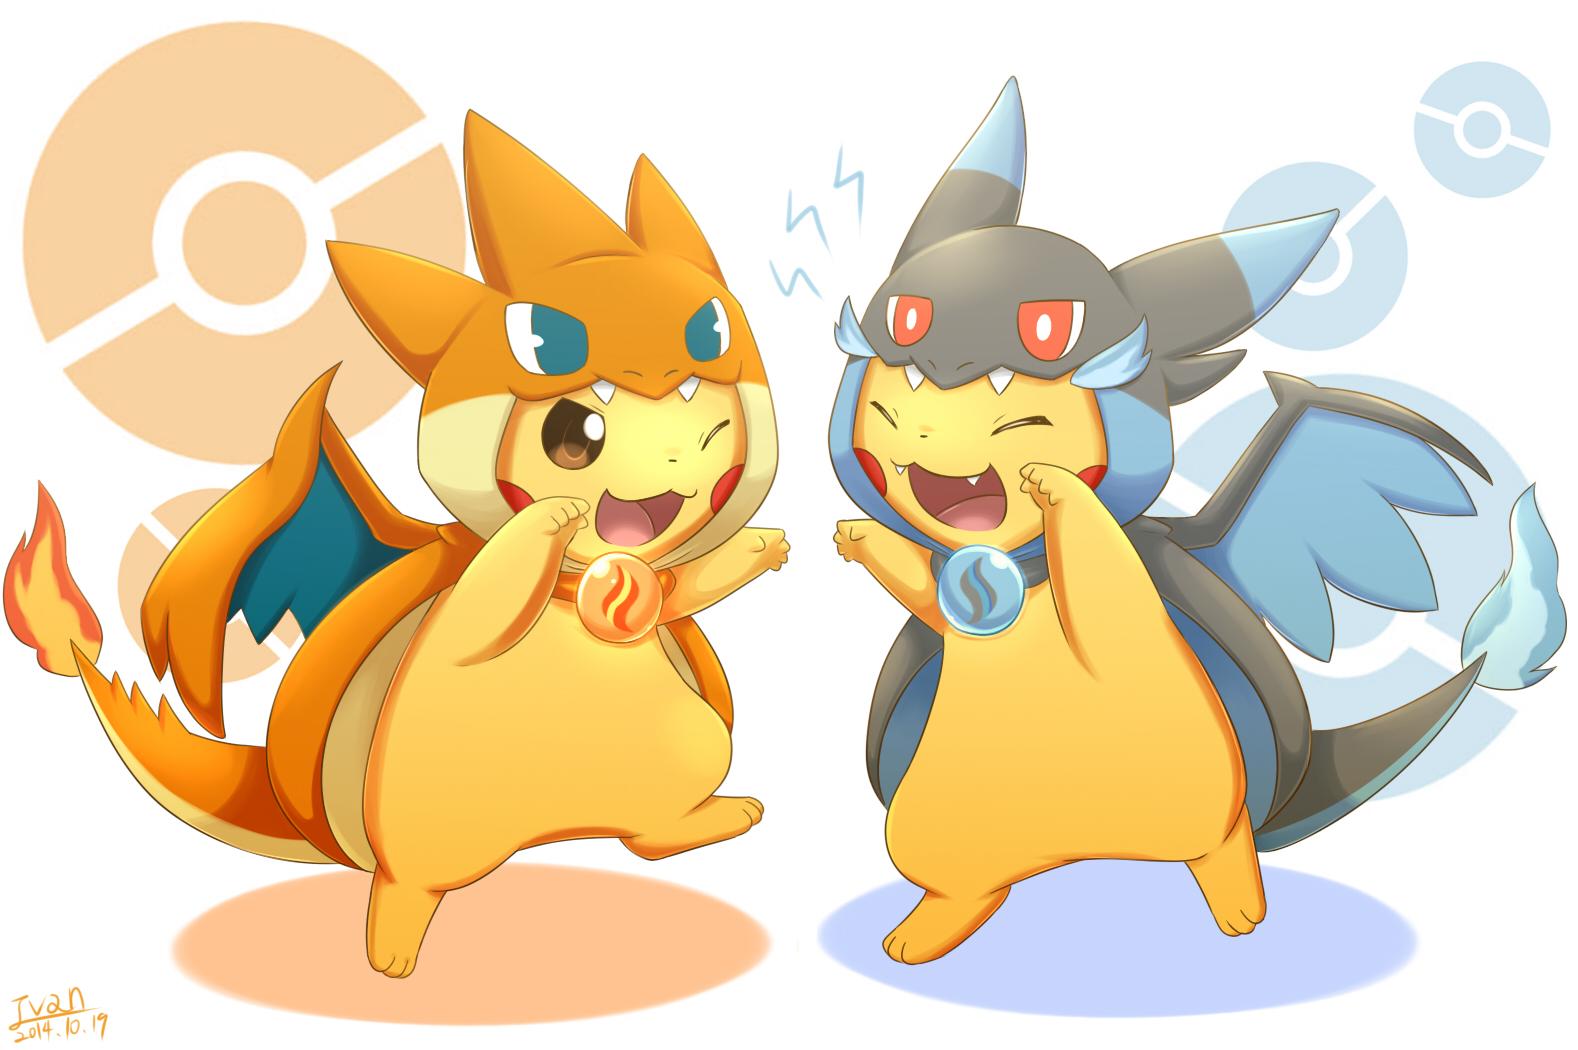 http://static.zerochan.net/Pikachu.full.1788501.jpg